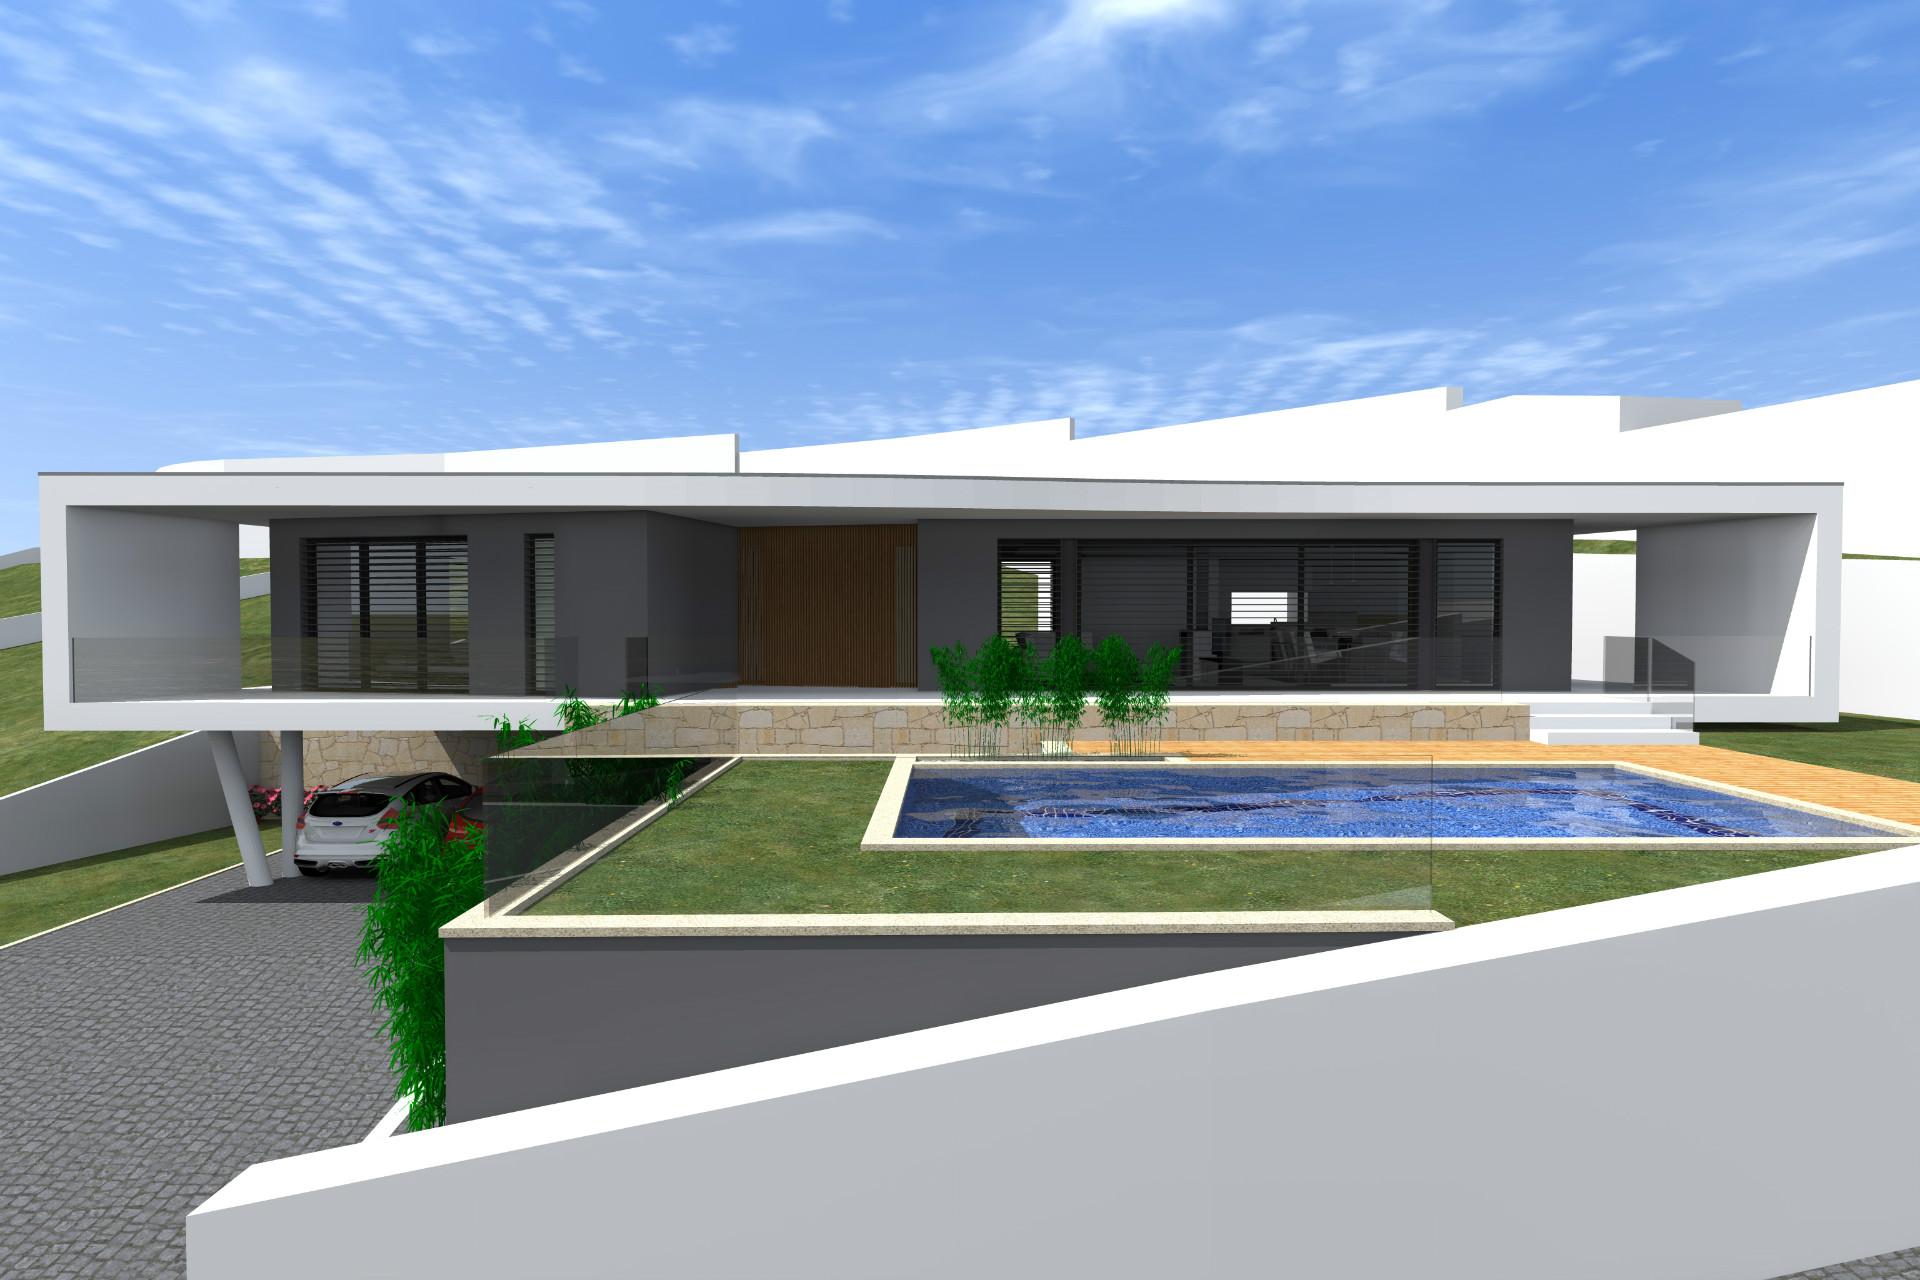 vila verde, centro, lote individual, panoramico, luxo